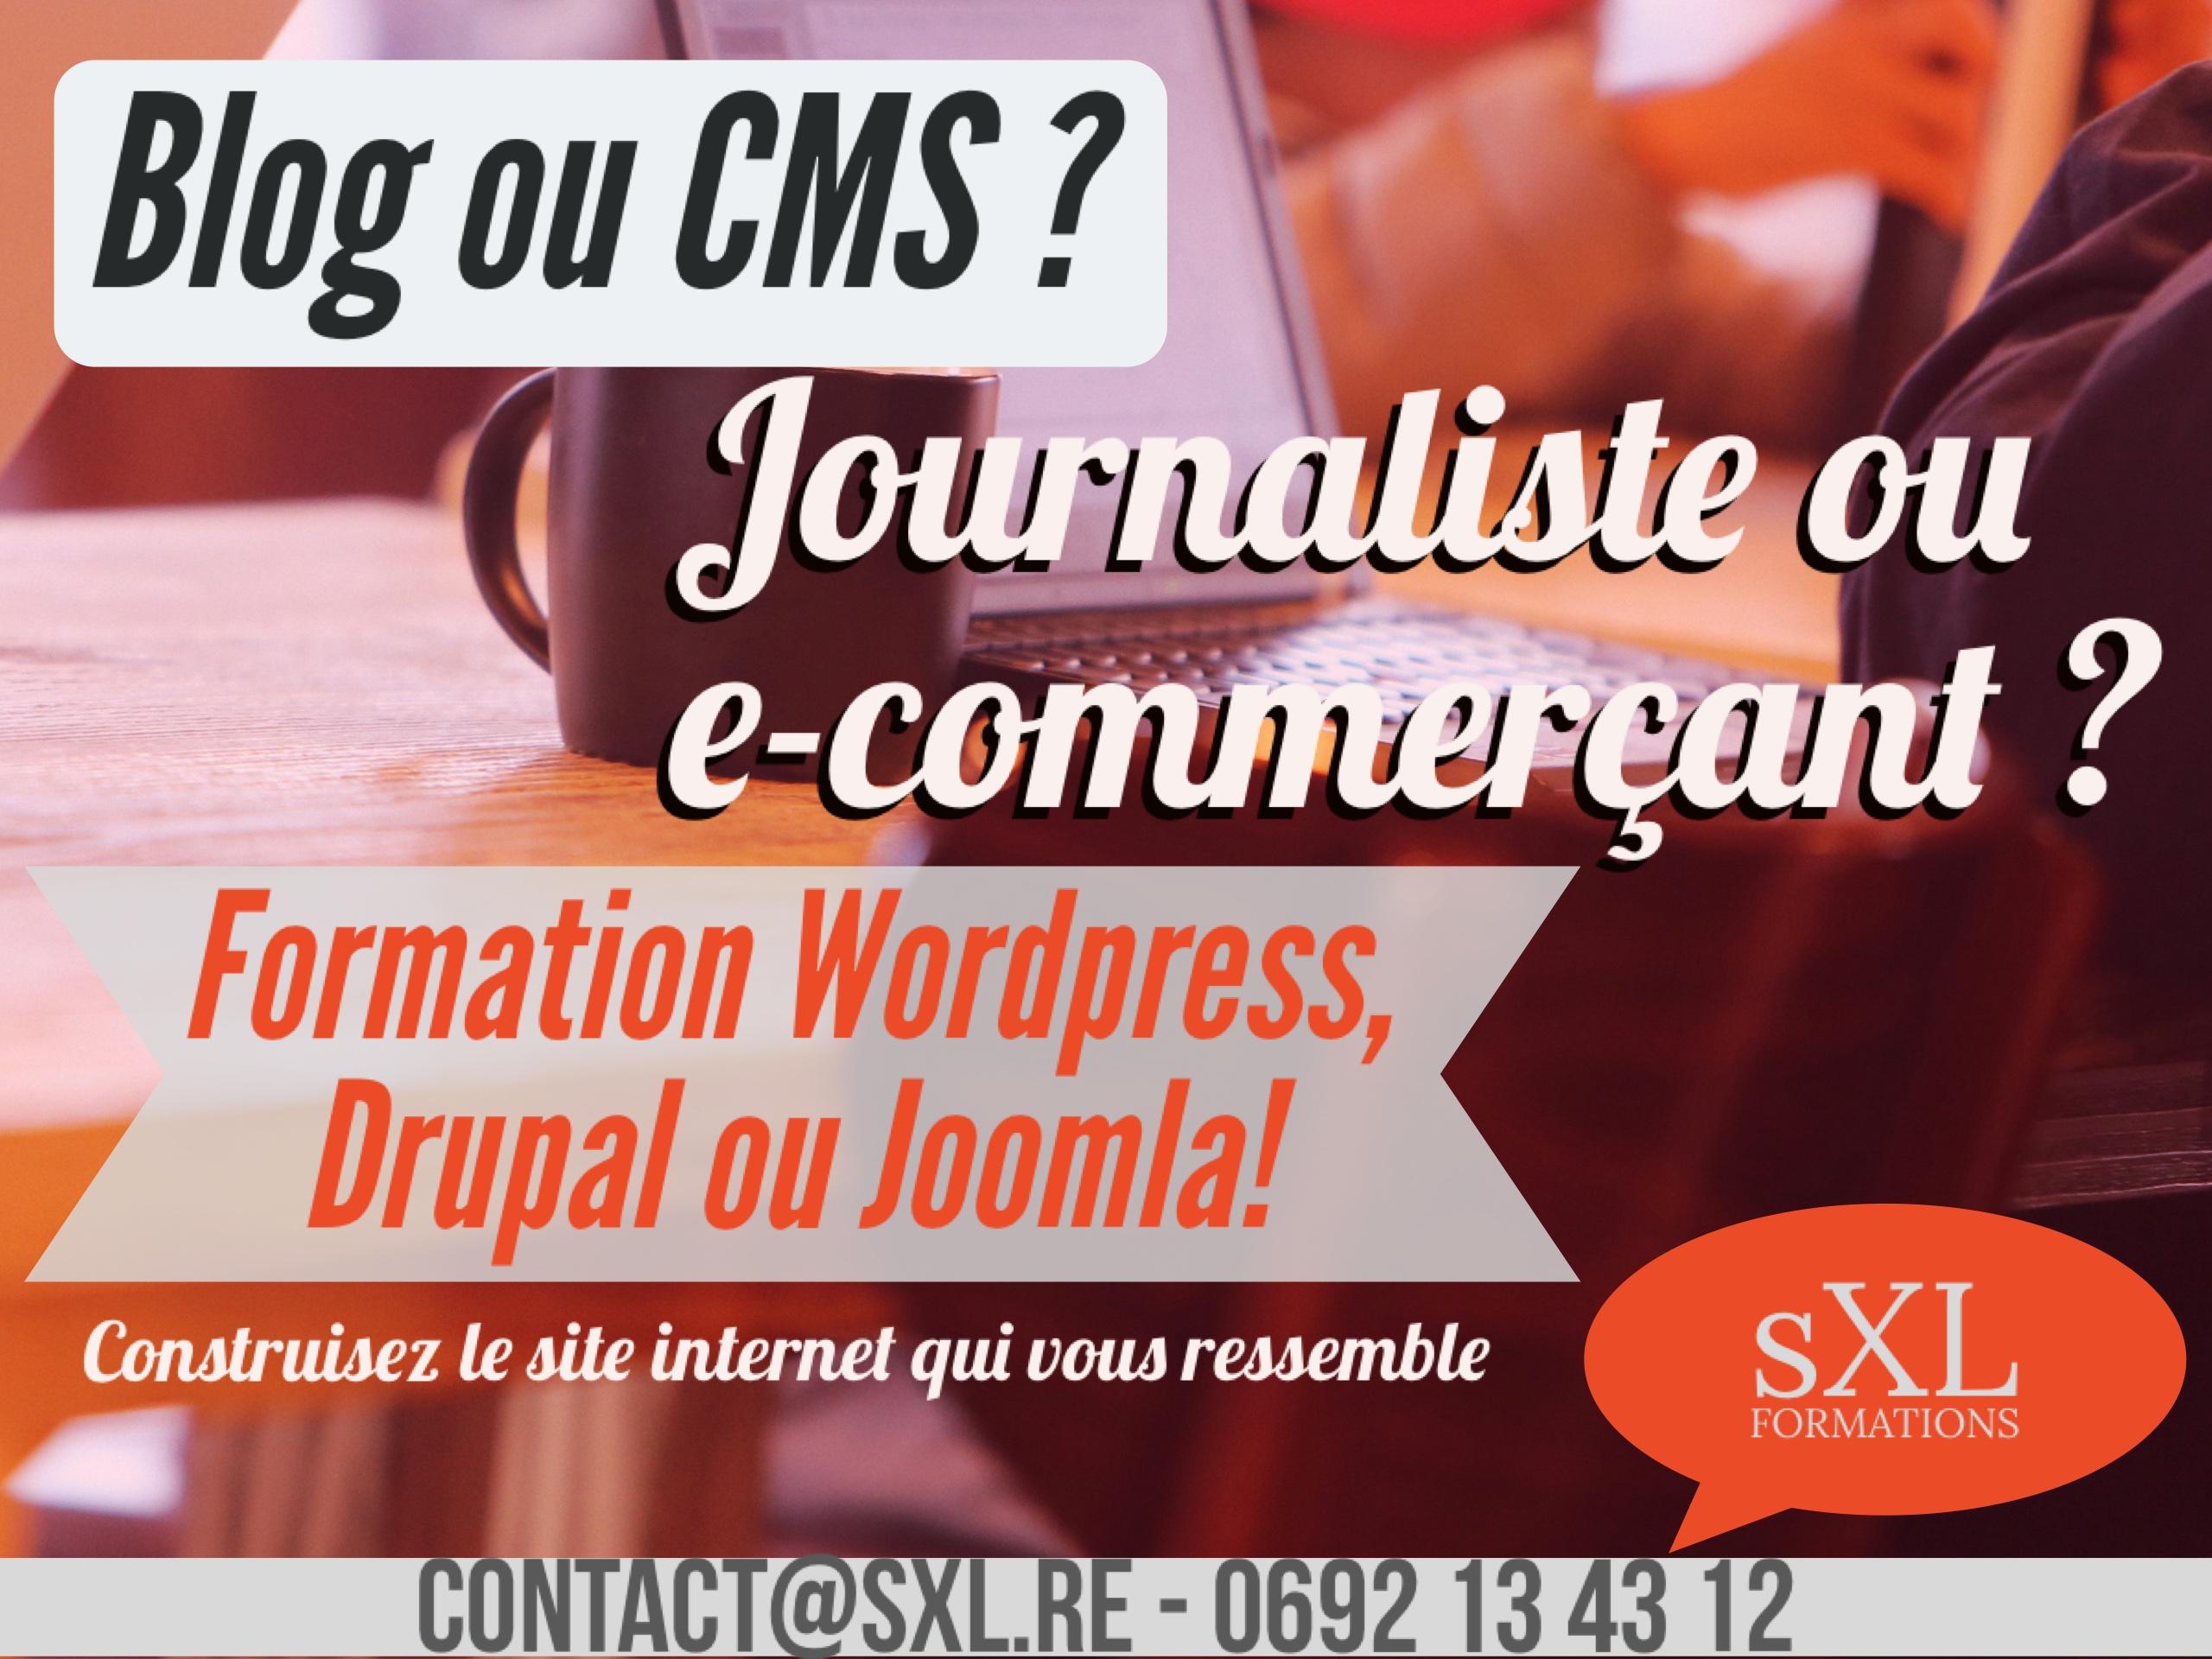 Formation wordpress, joomla! ou drupal Ile de La Réunion